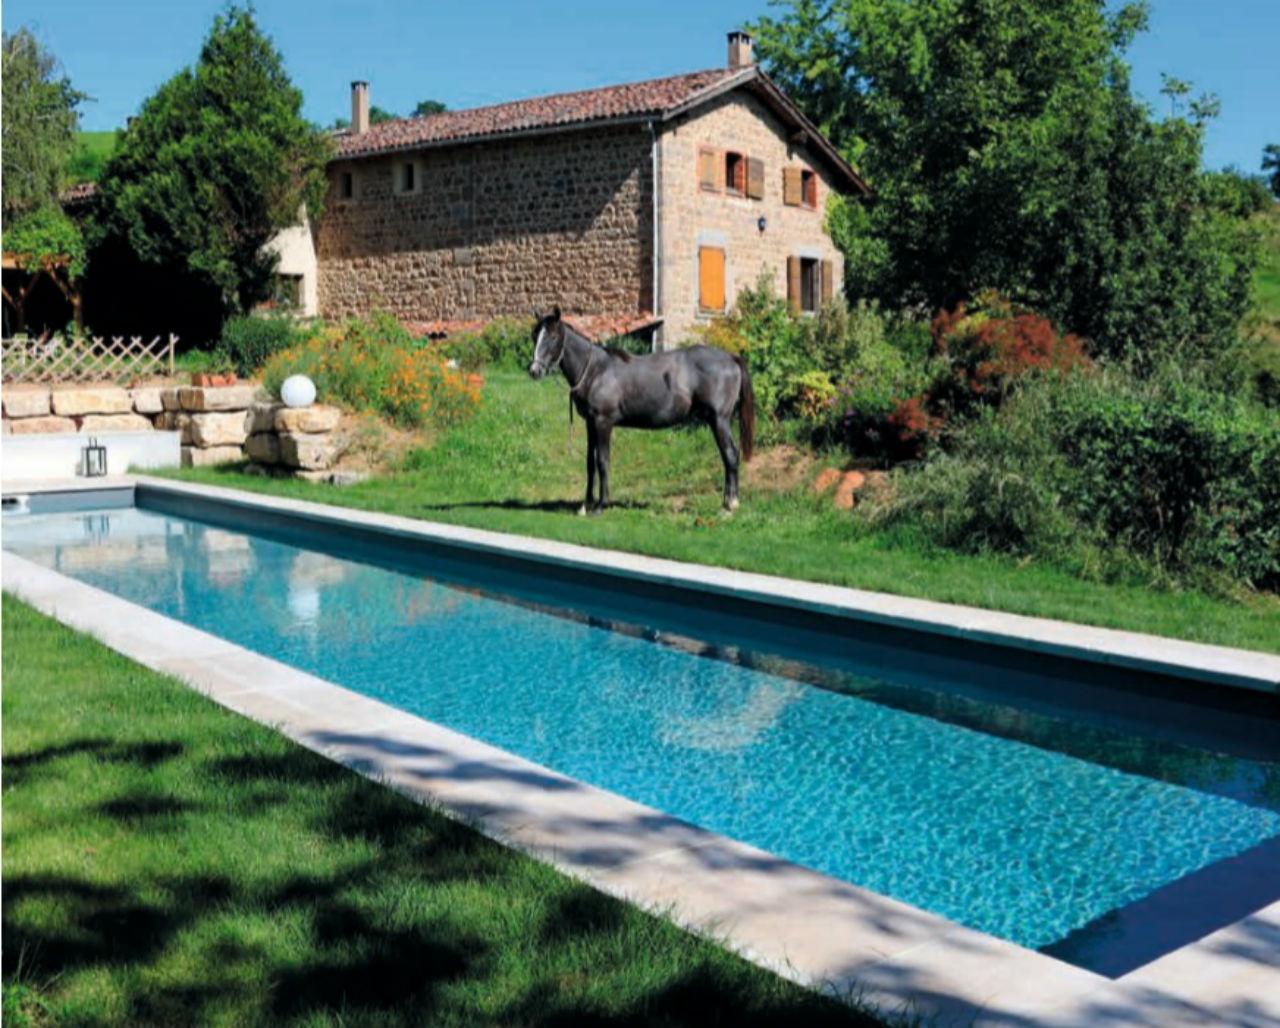 basen pływacki desjoyaux